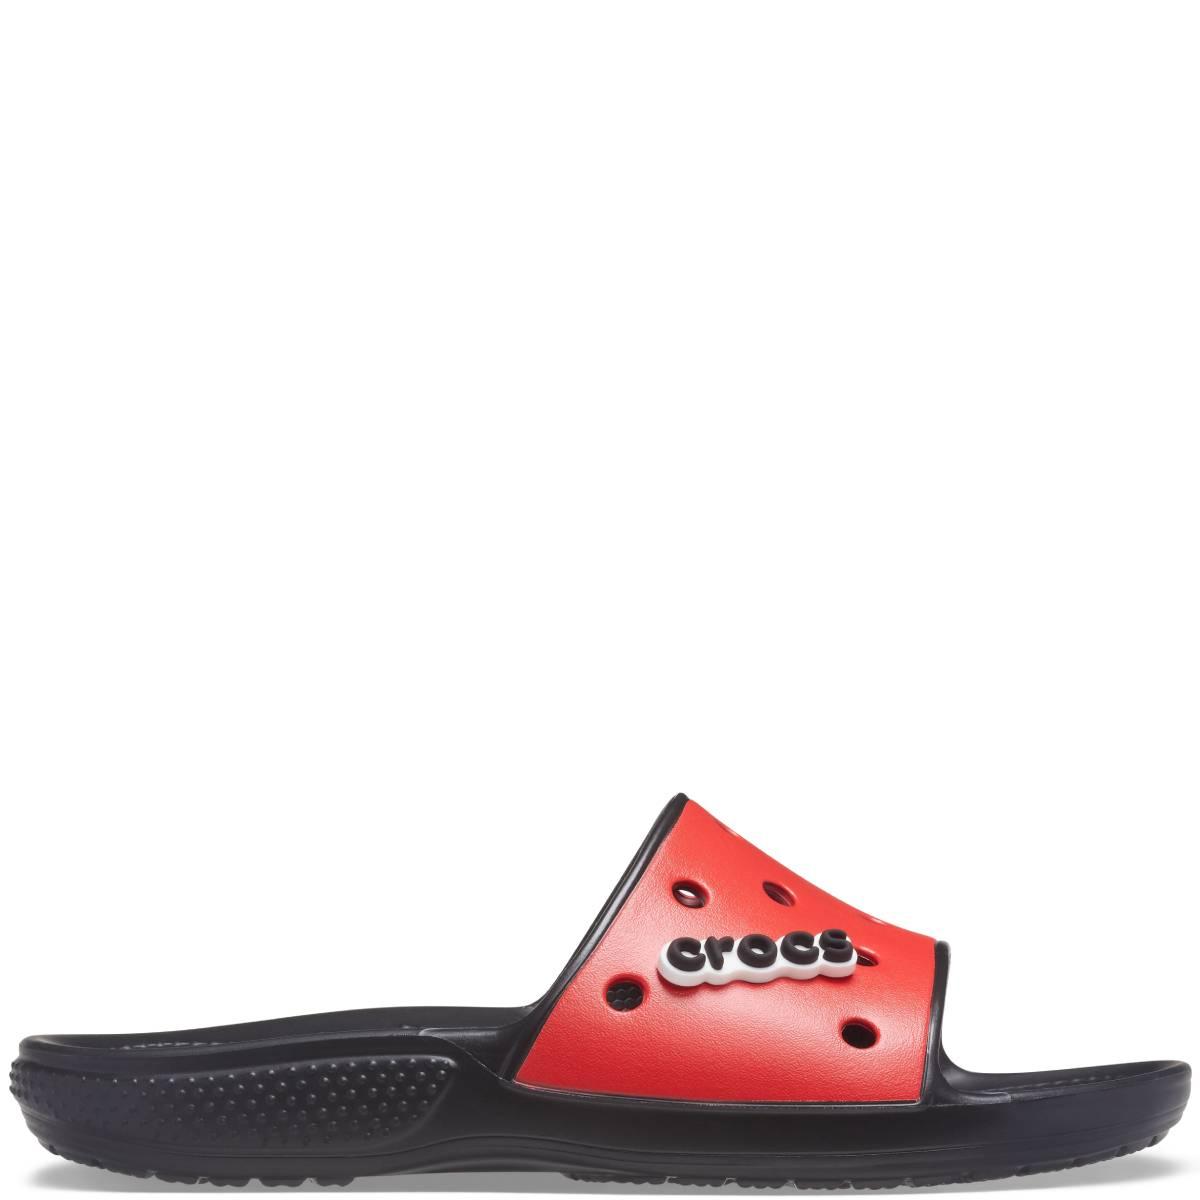 Classic Crocs Colorblock Slide - Siyah kırmızı